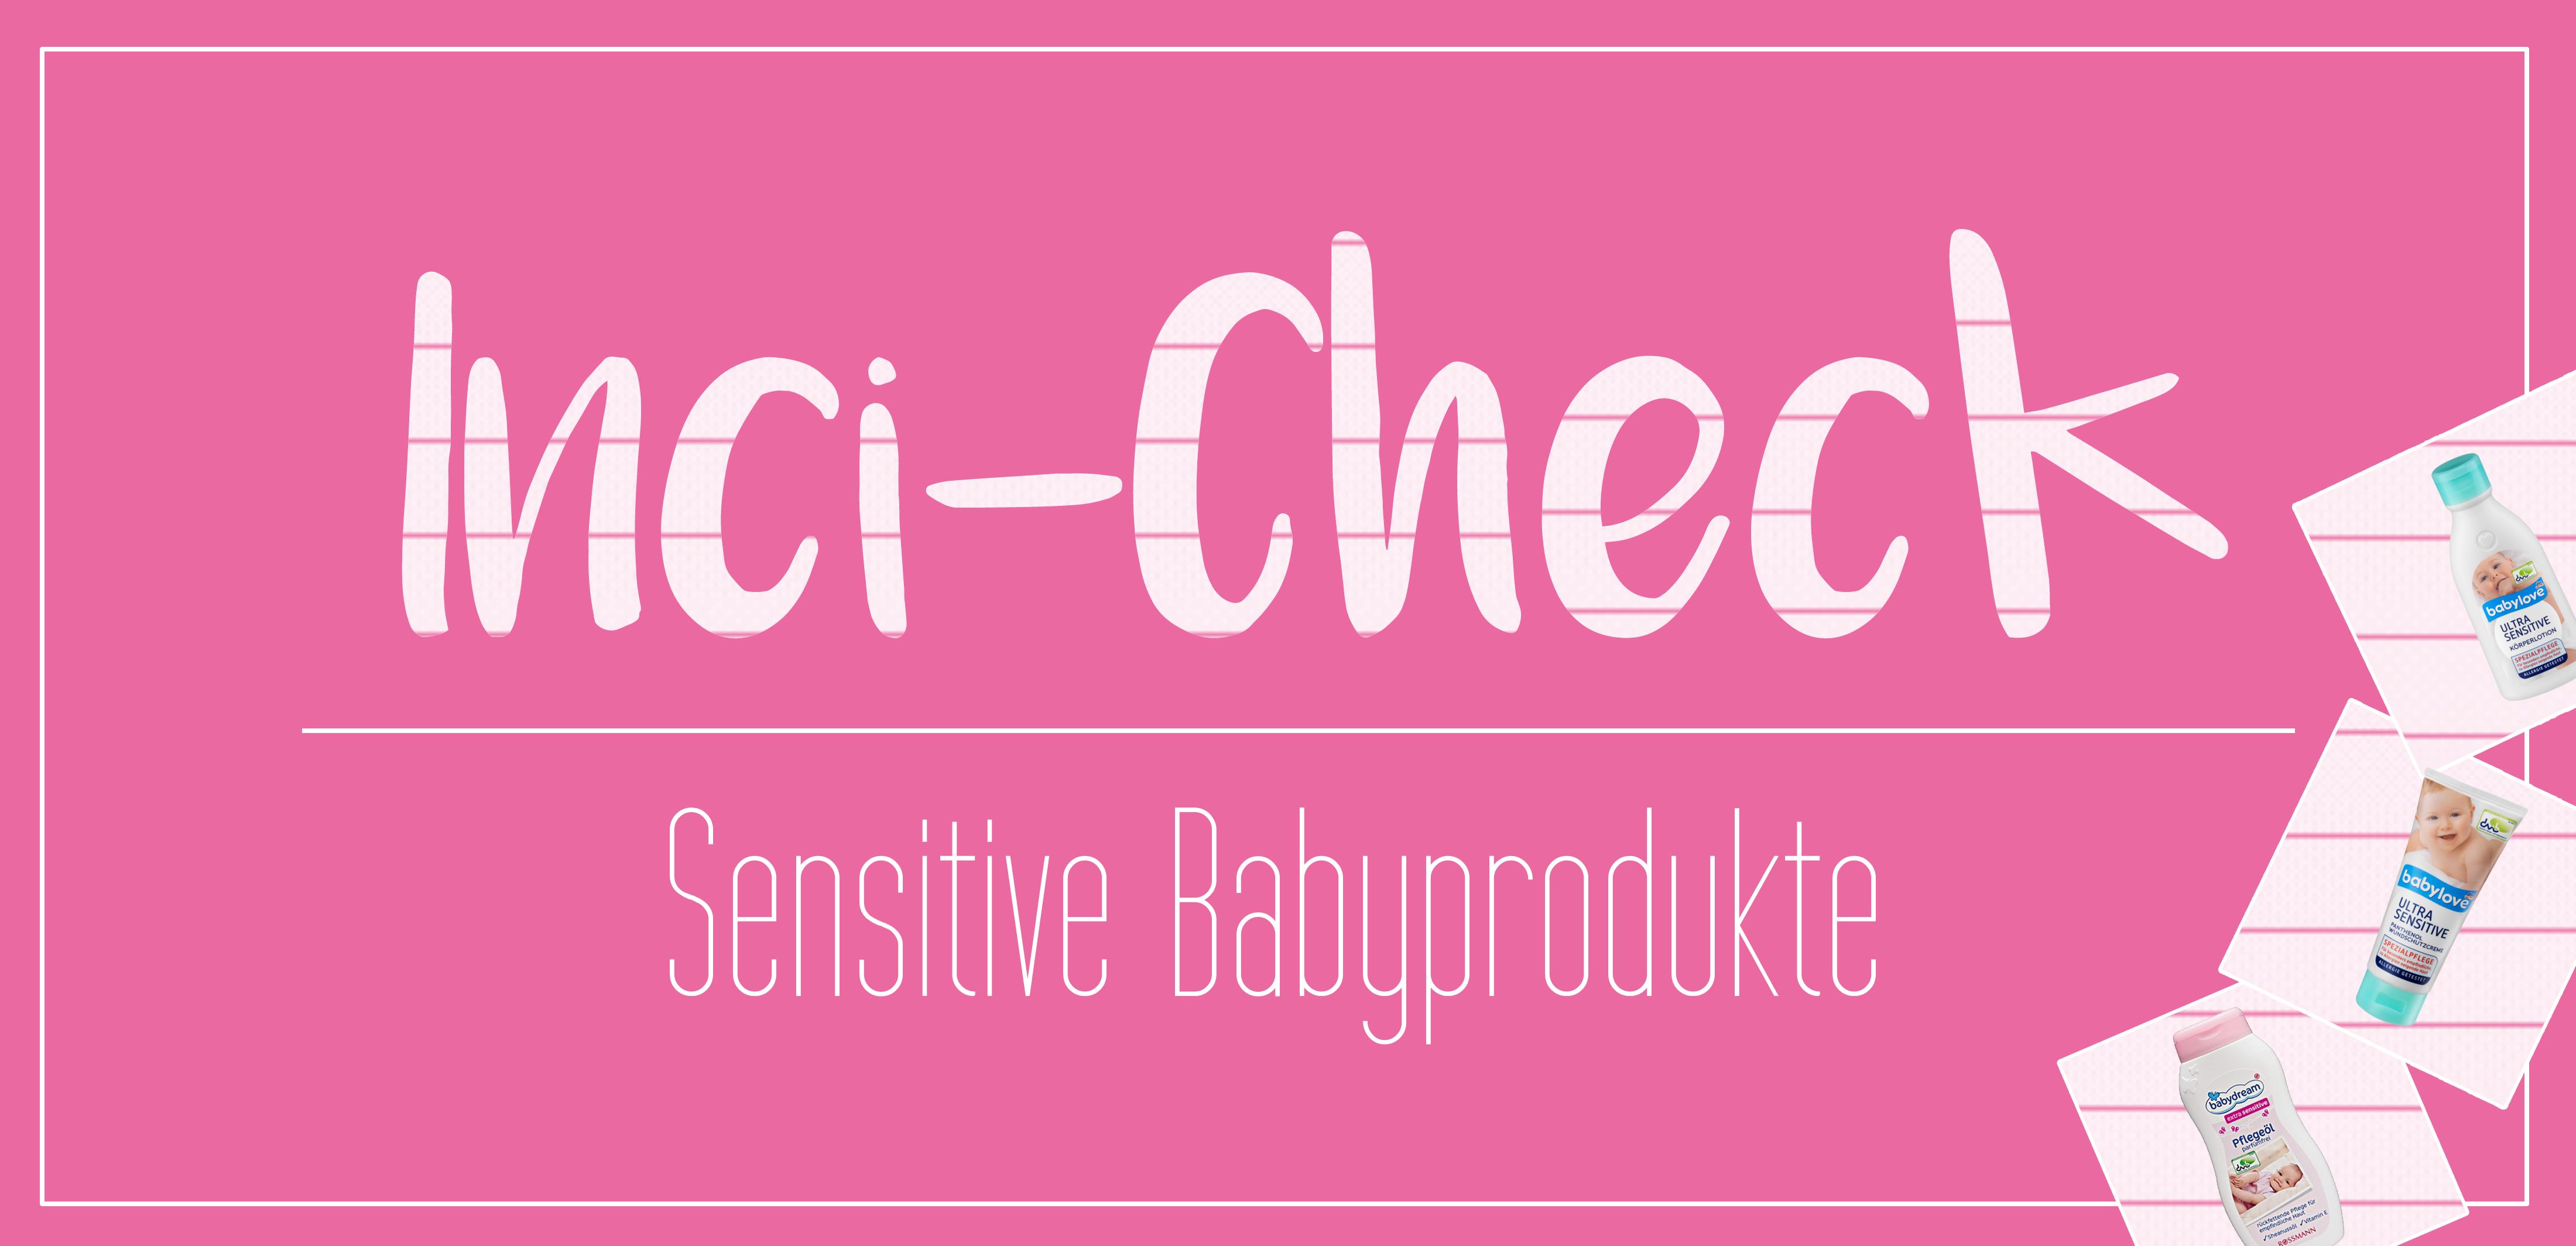 inci_babyprodukte1